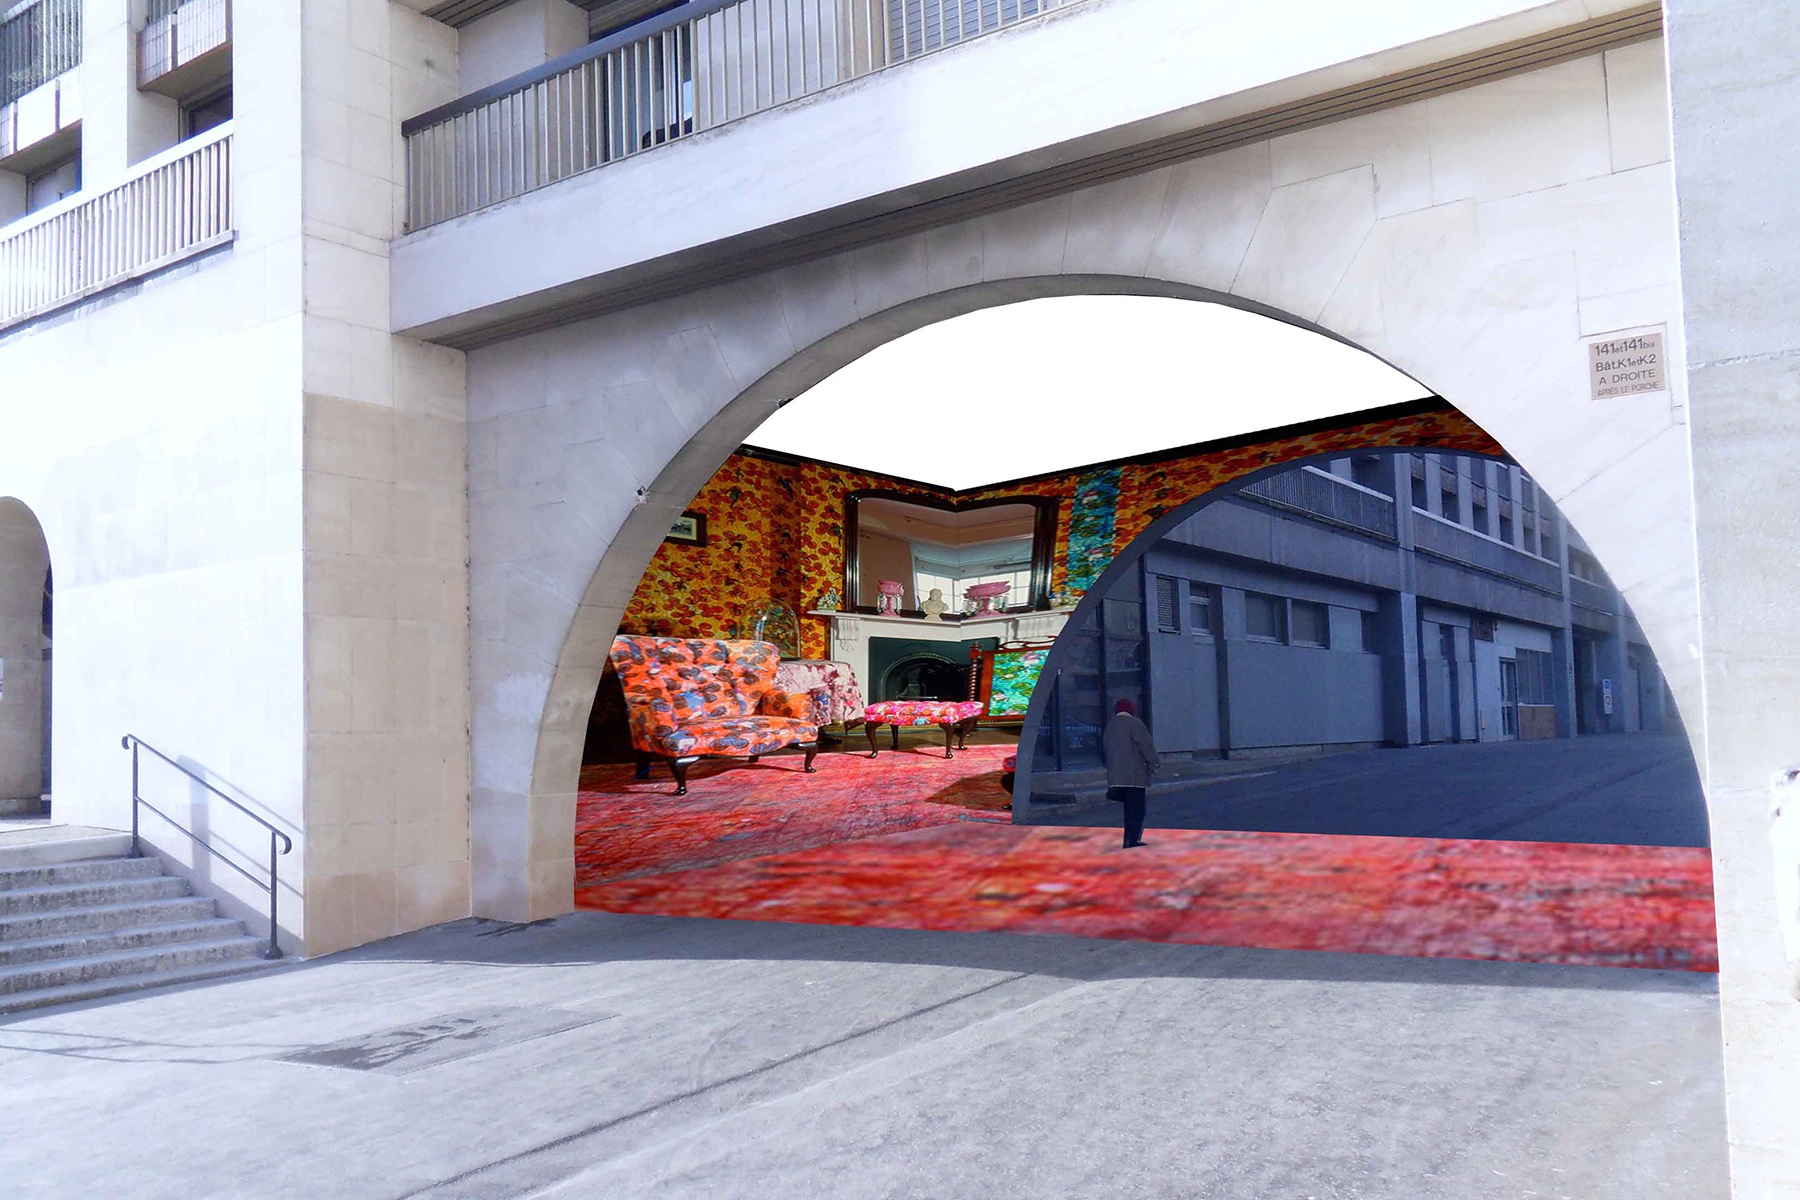 cover interieur rue design mobilier urbain dentelle metallique resille